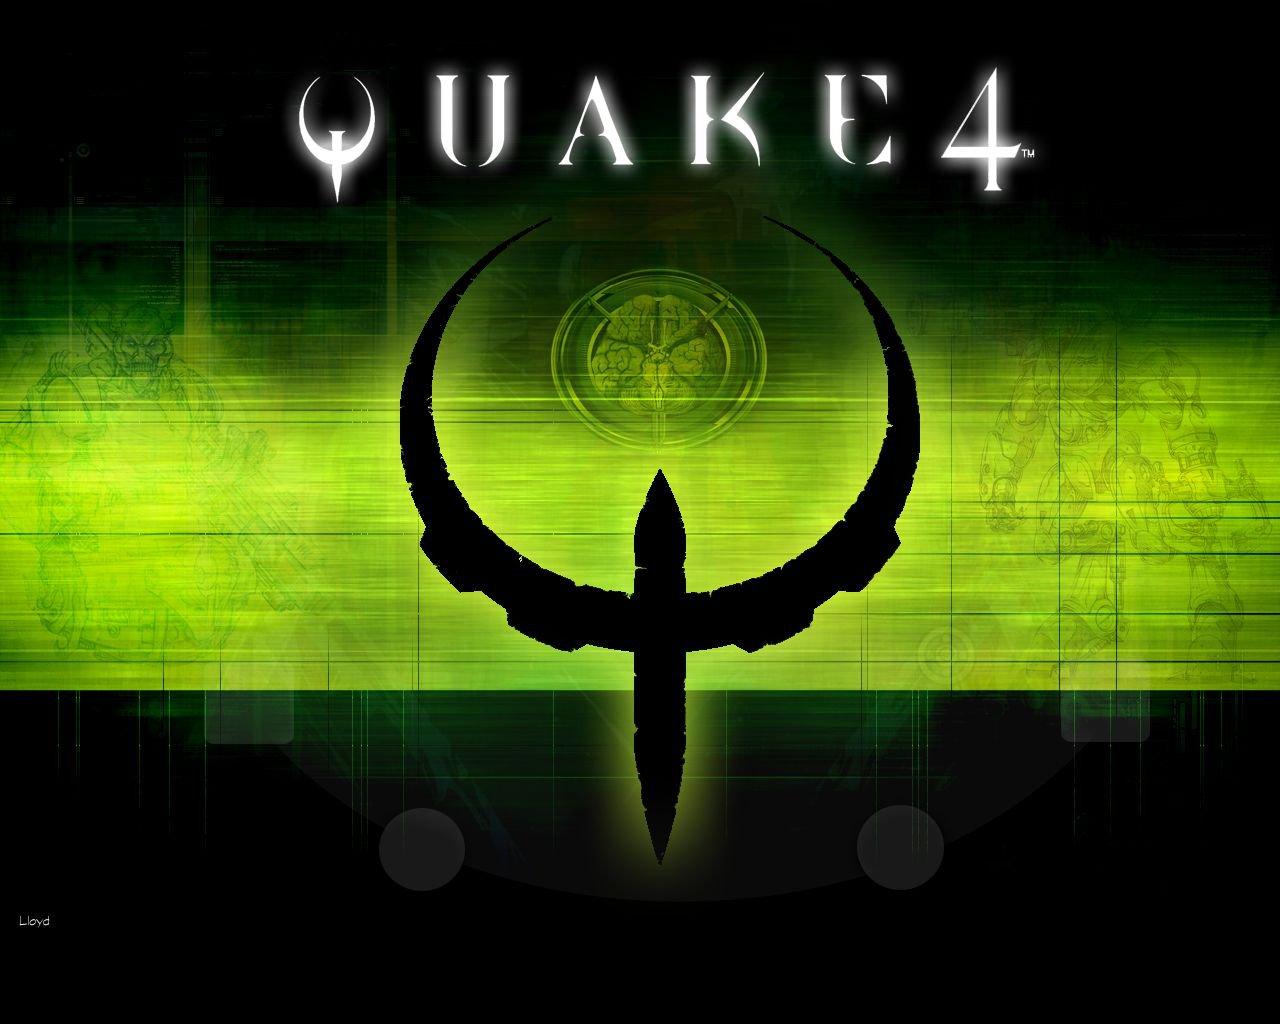 Quake 4 Wallpaper by igotgame1075 1280x1024